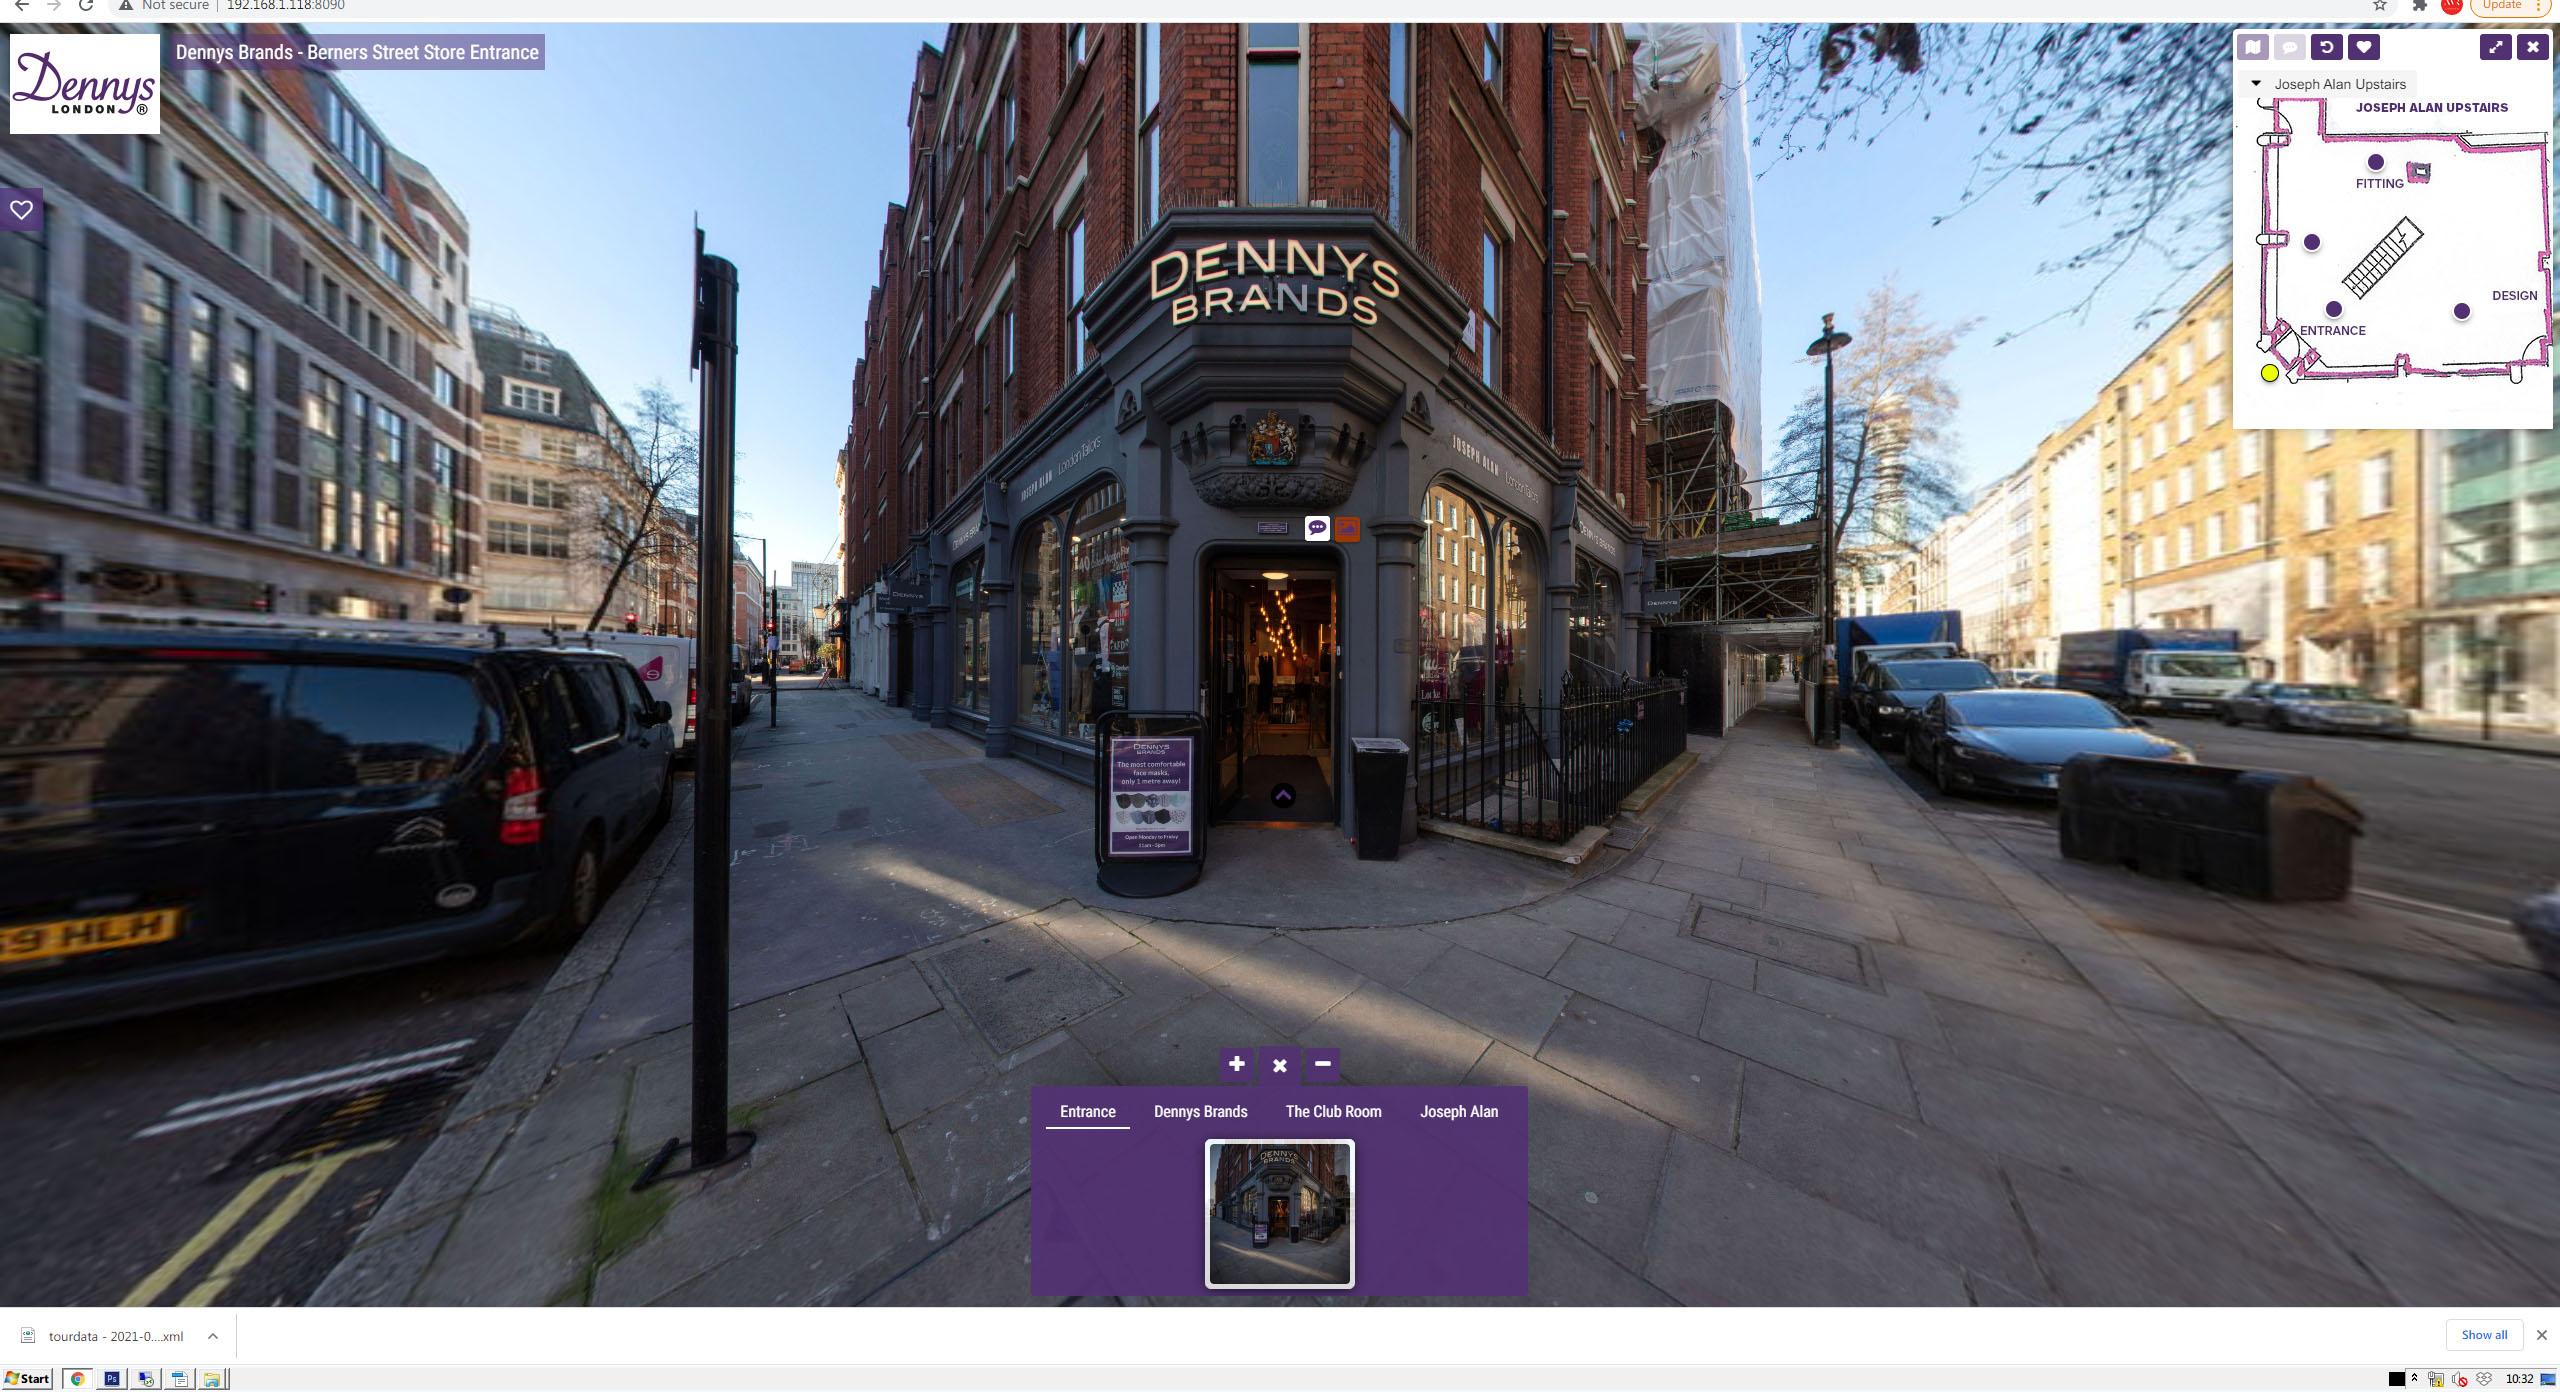 Dennys Brands Virtual Roadside View